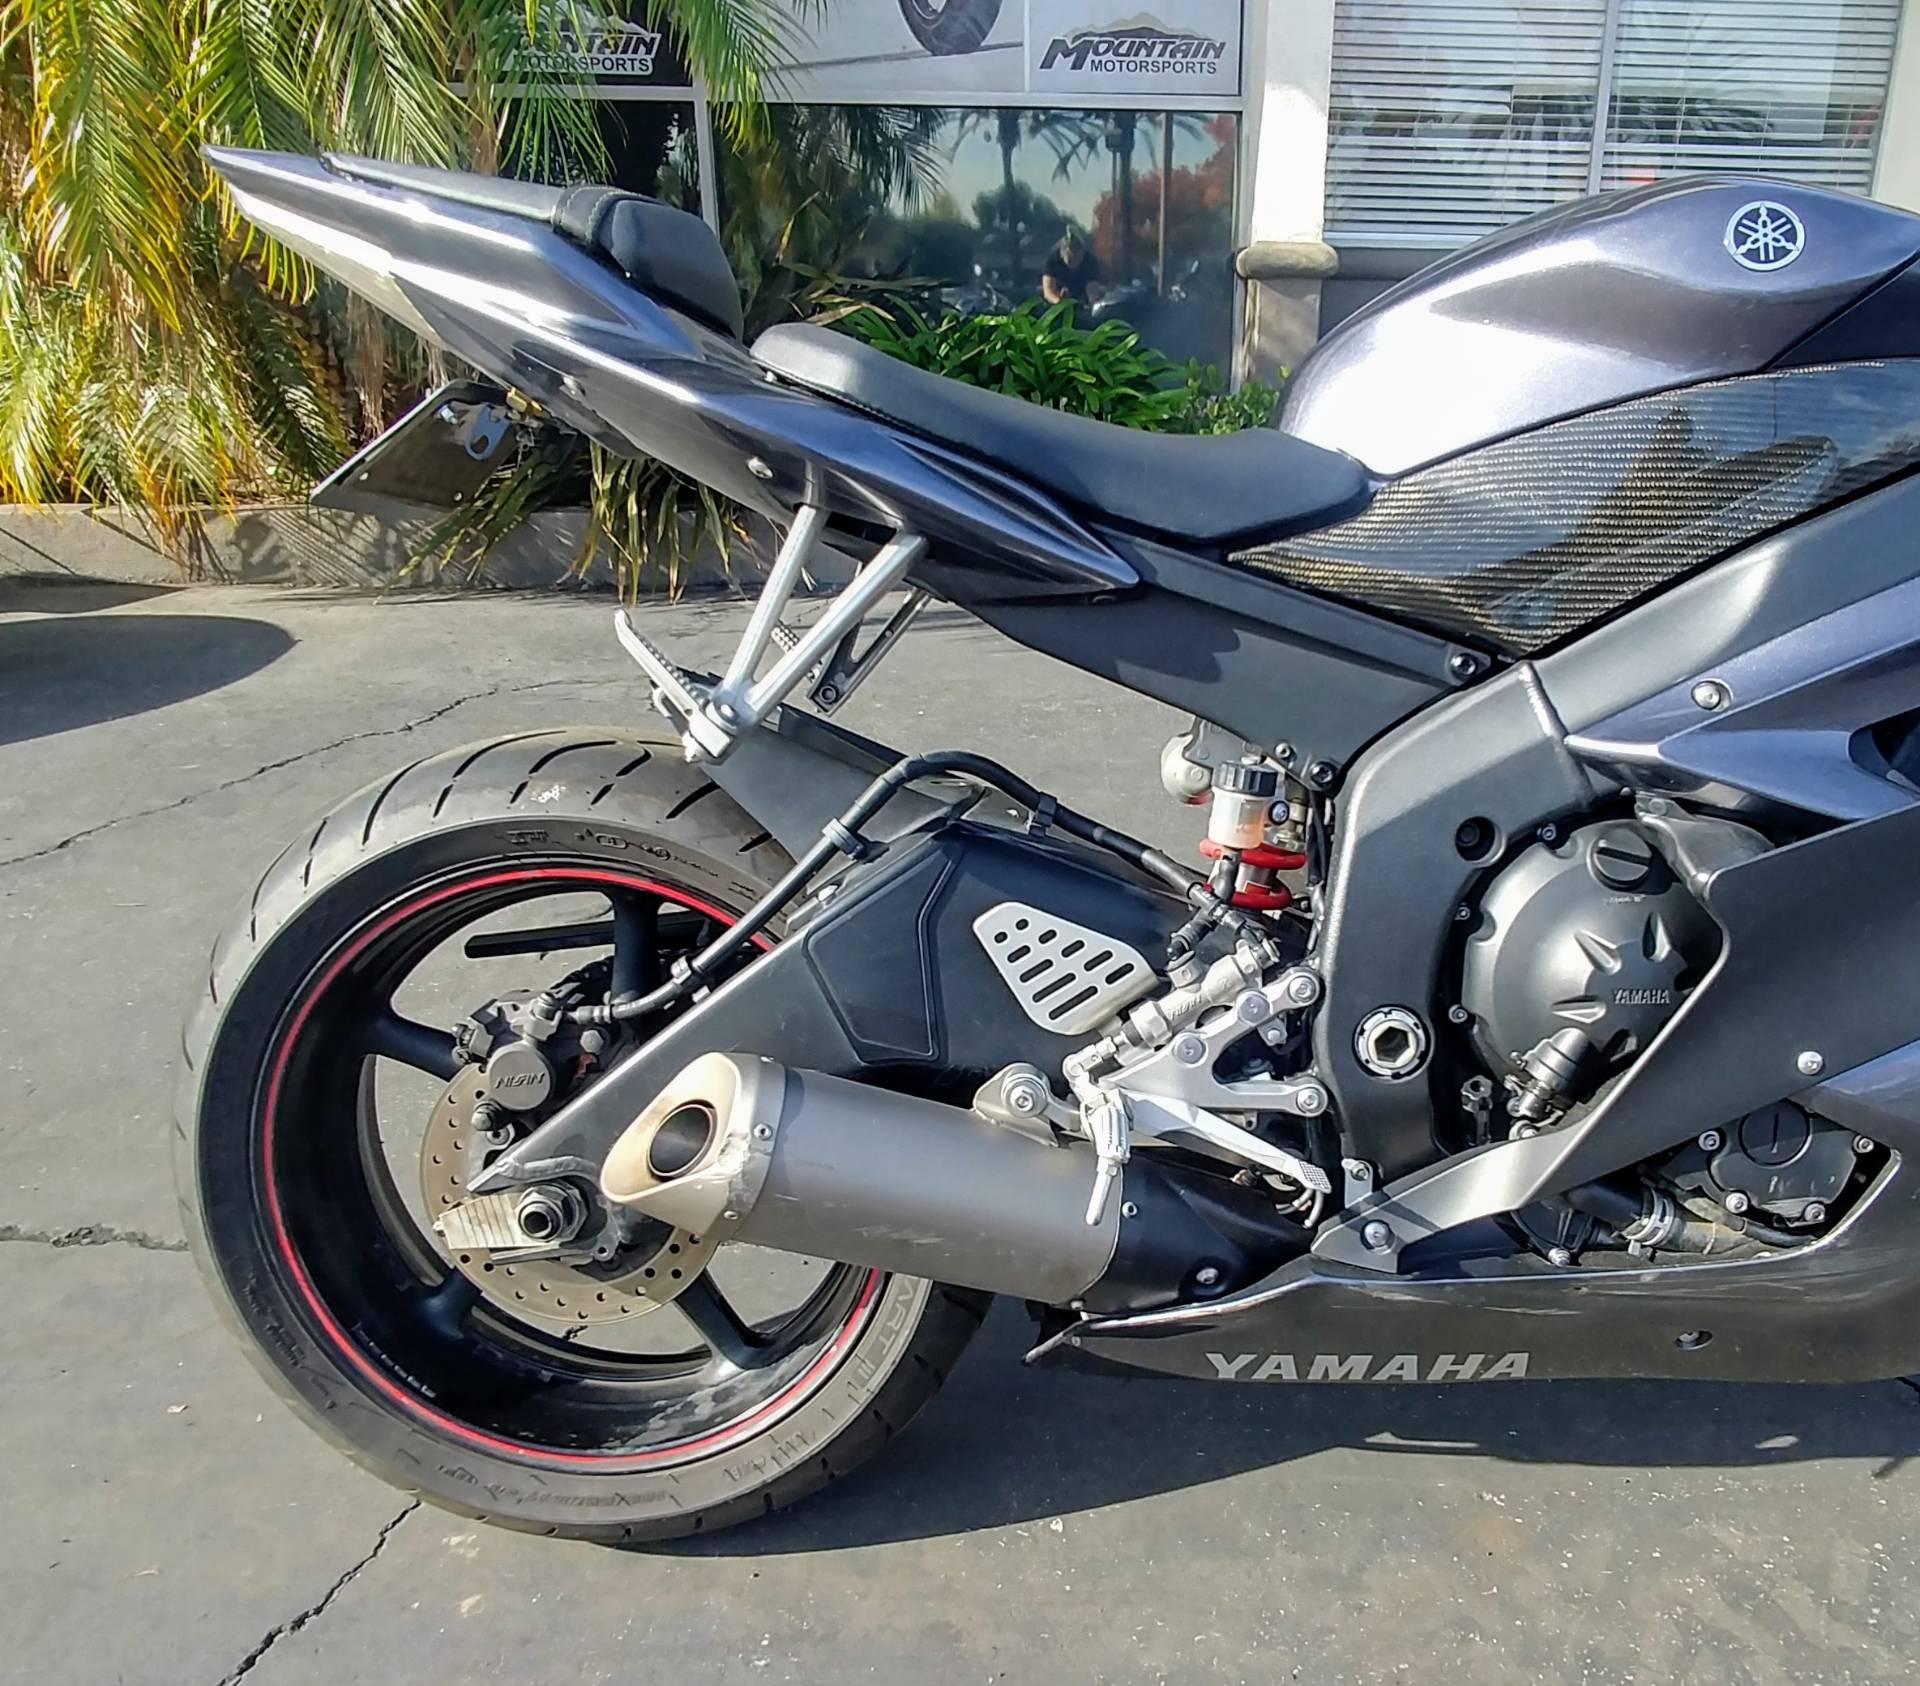 2007 Yamaha YZF-R6 5